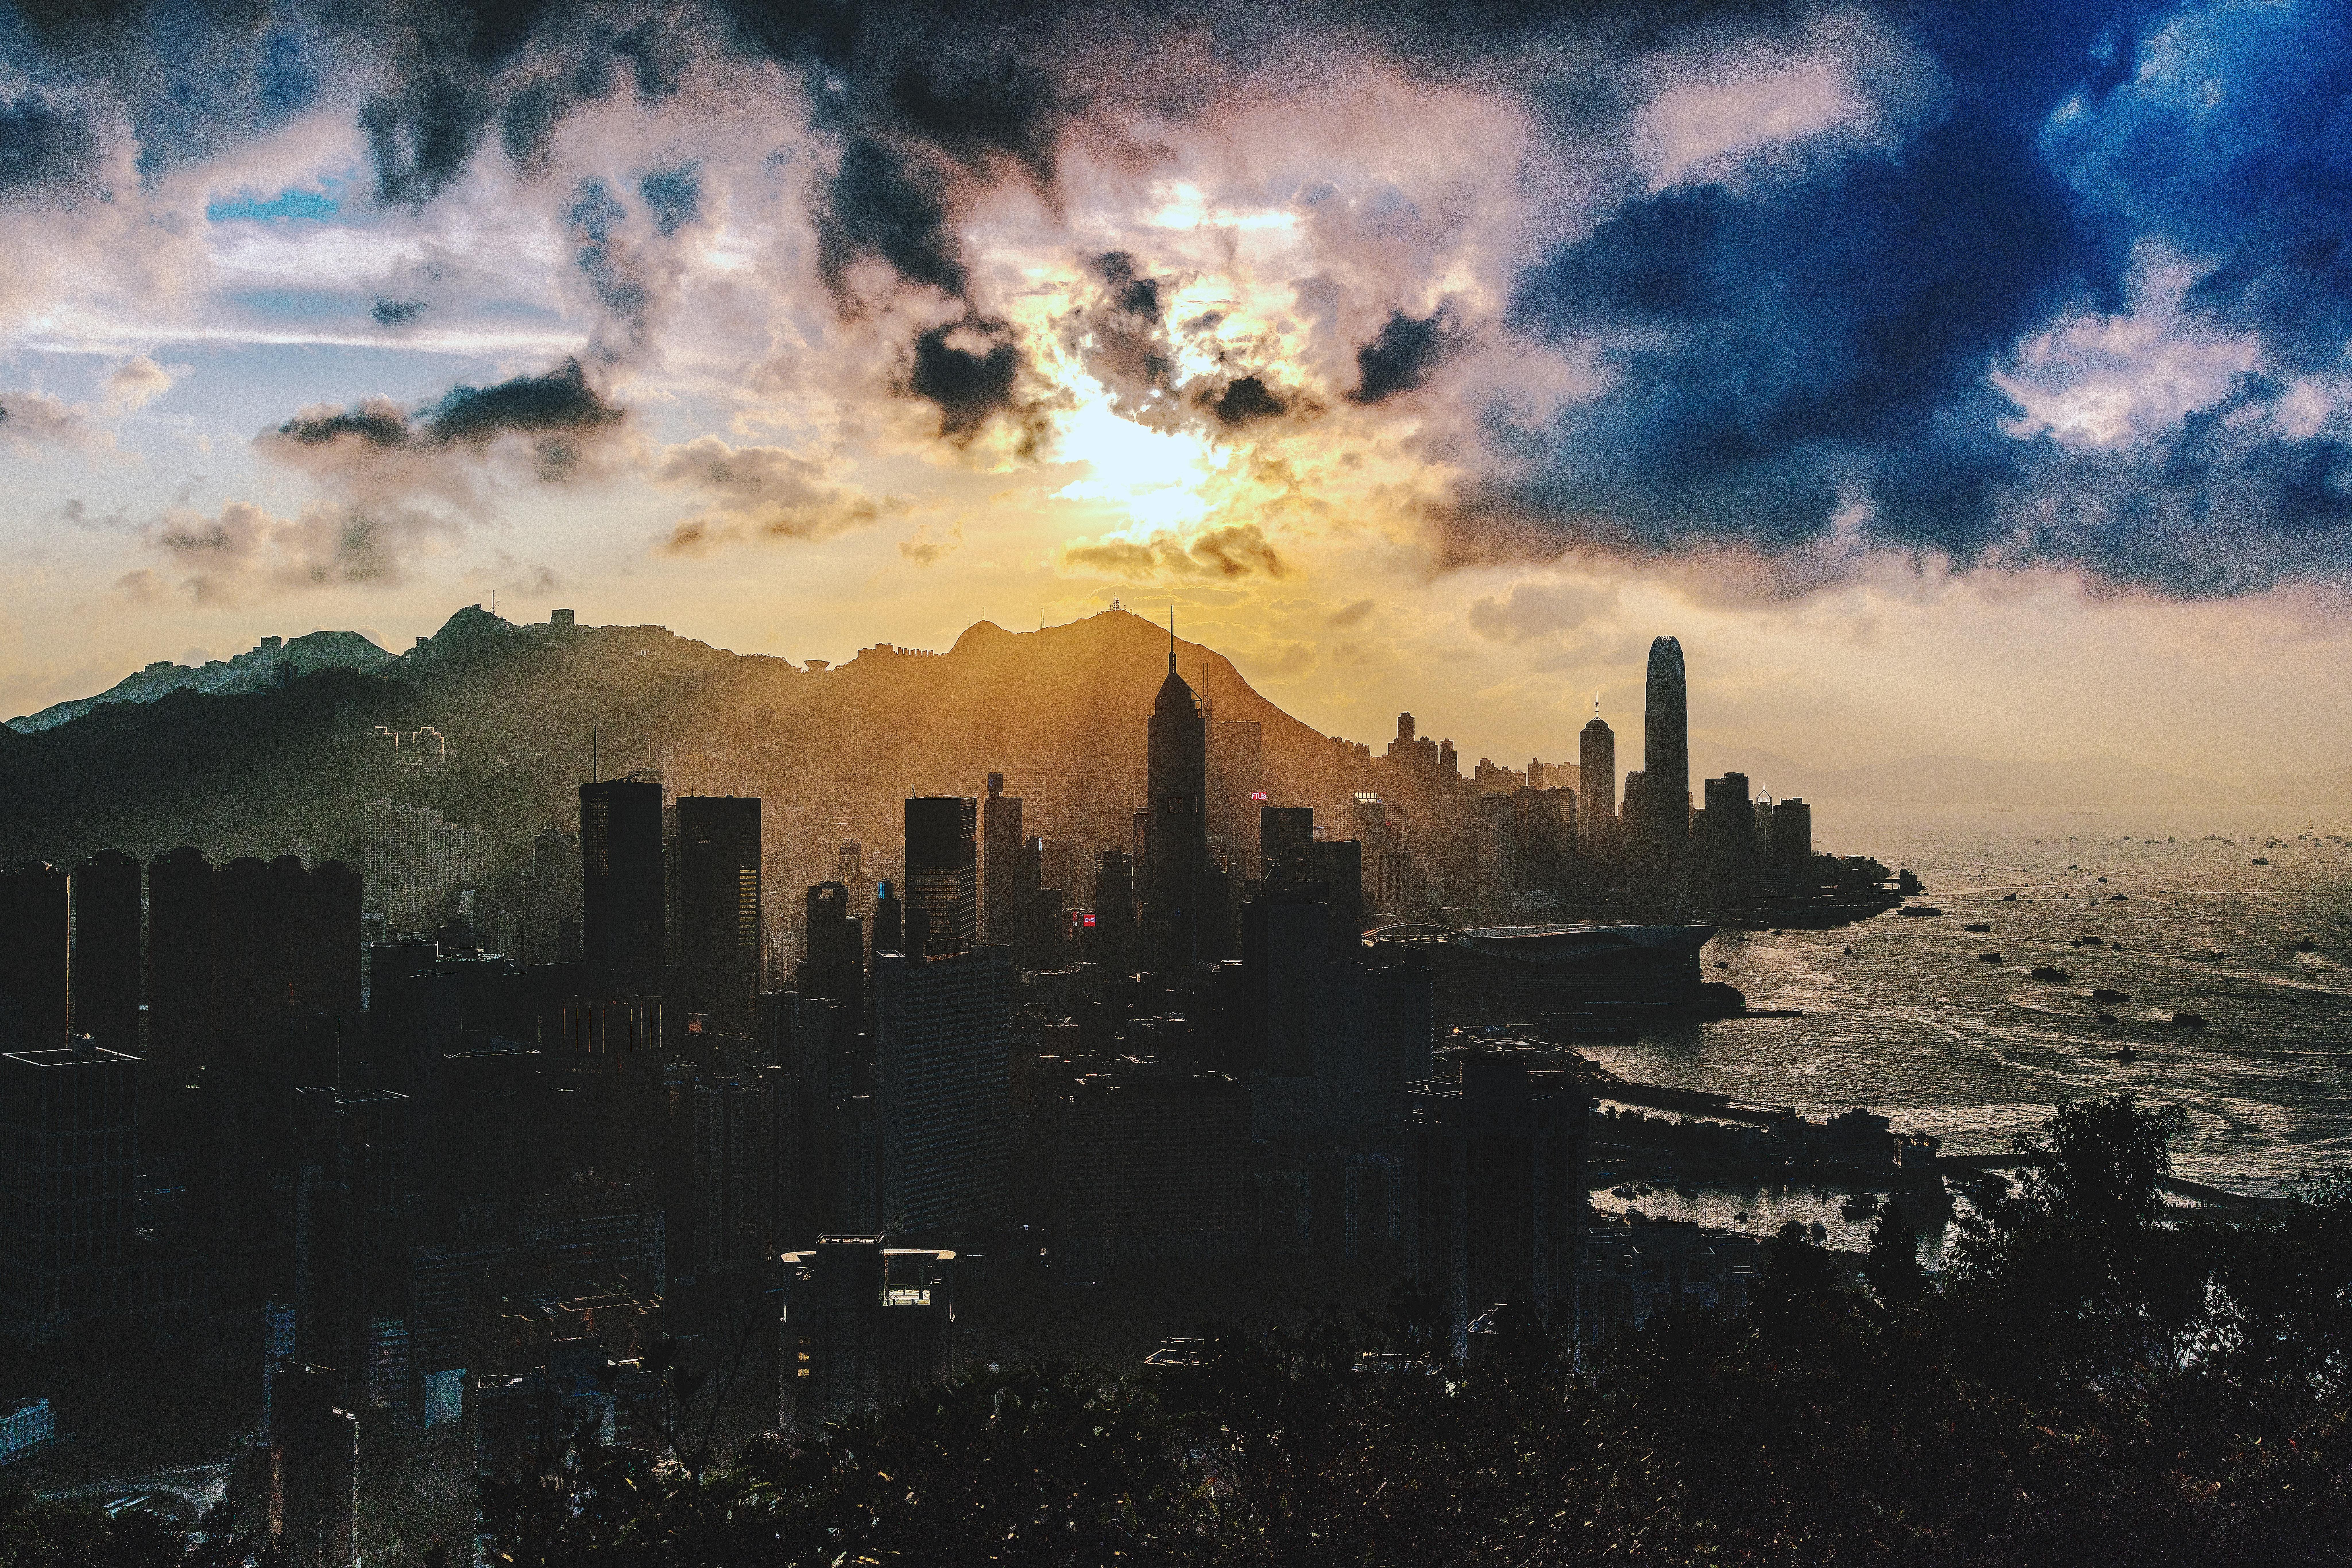 Bird's eye view of city near ocean during sunset photo